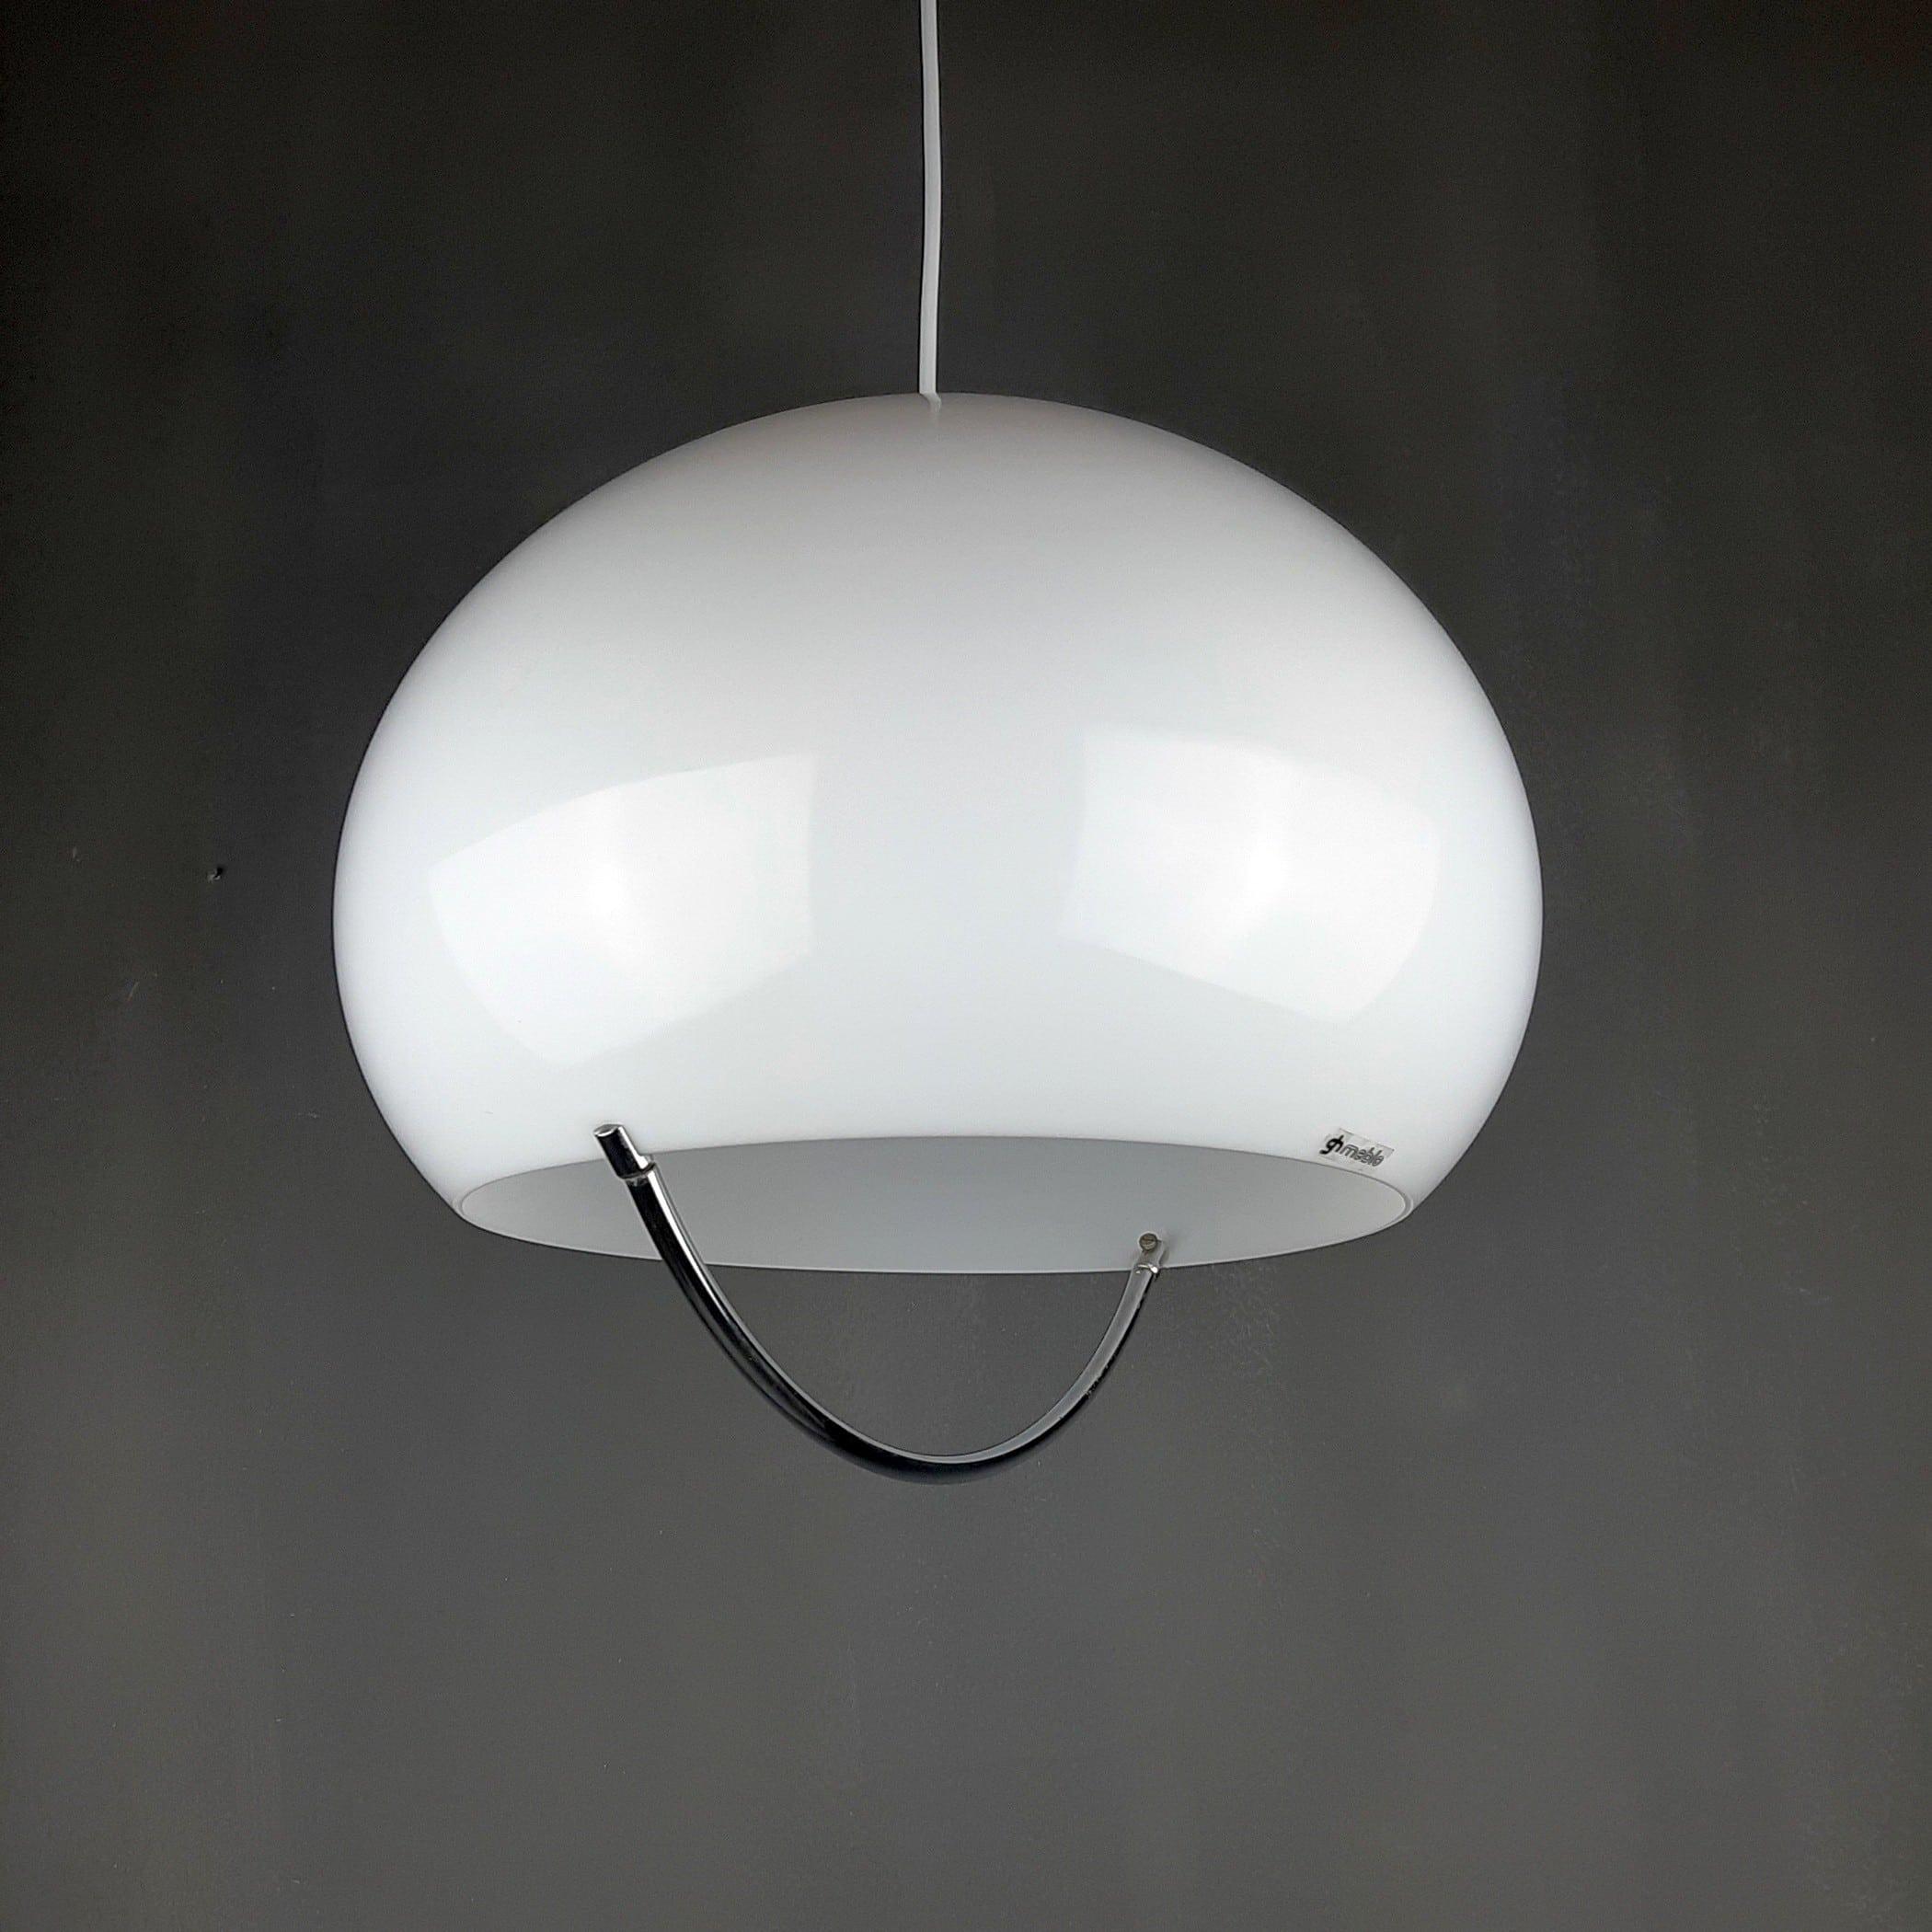 Mid-century White Pendant Lamp Meblo Guzzini 1970s Yugoslavia Italia